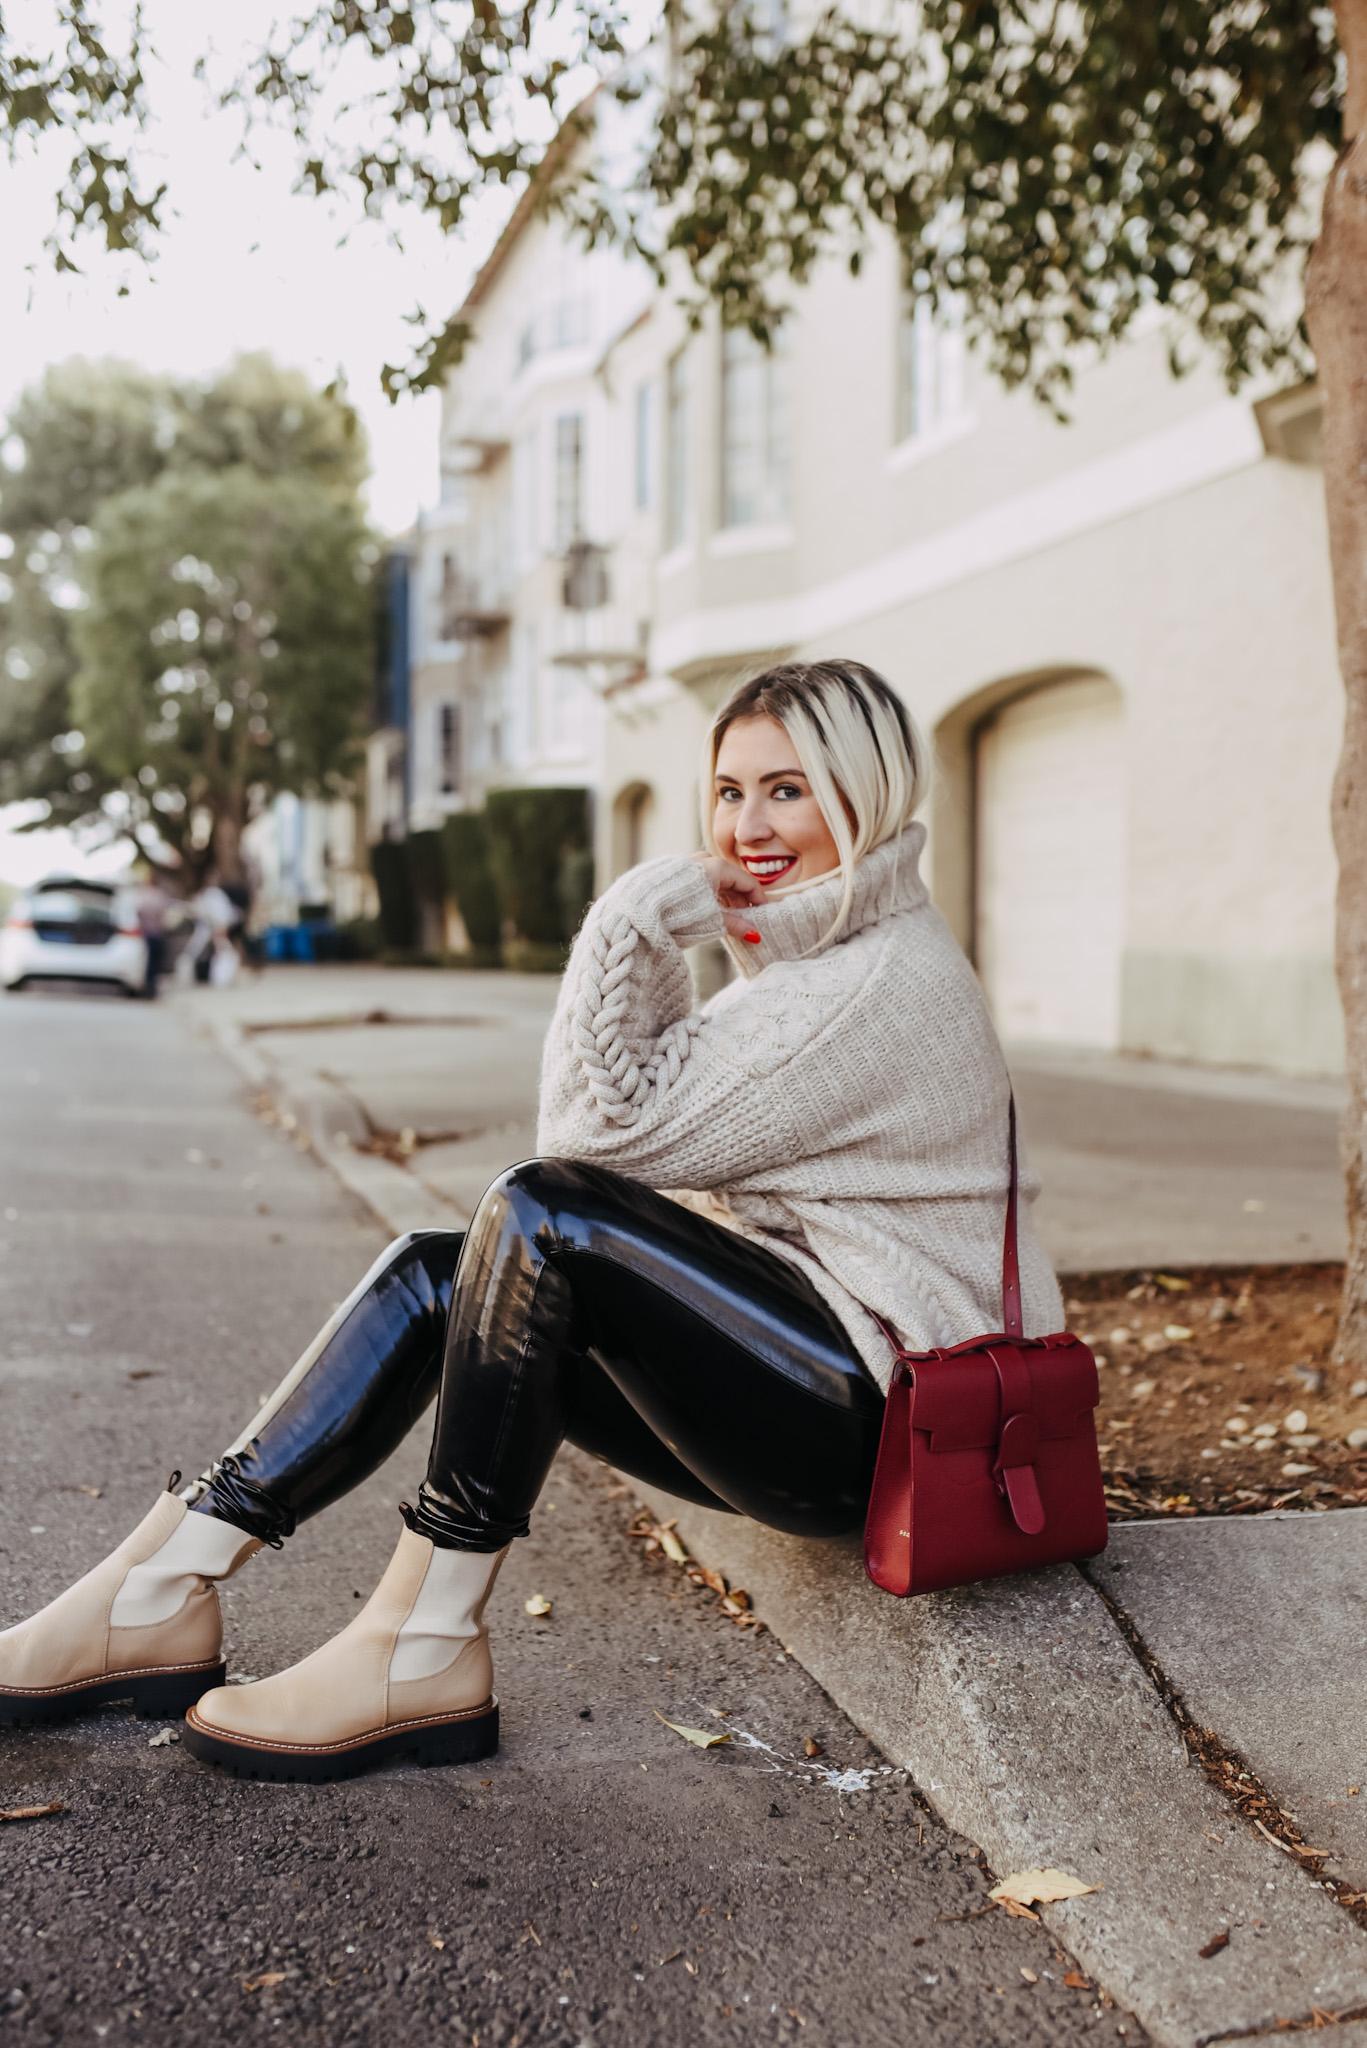 Sam Edelman Laguna Chelsea Boots, Spanx Plastic Pants, Senreve Review, Senreve Discount Code, Senreve Alunna Bag Review, KatWalkSF, Kat Ensign, San Francisco Blogger, Senreve Review